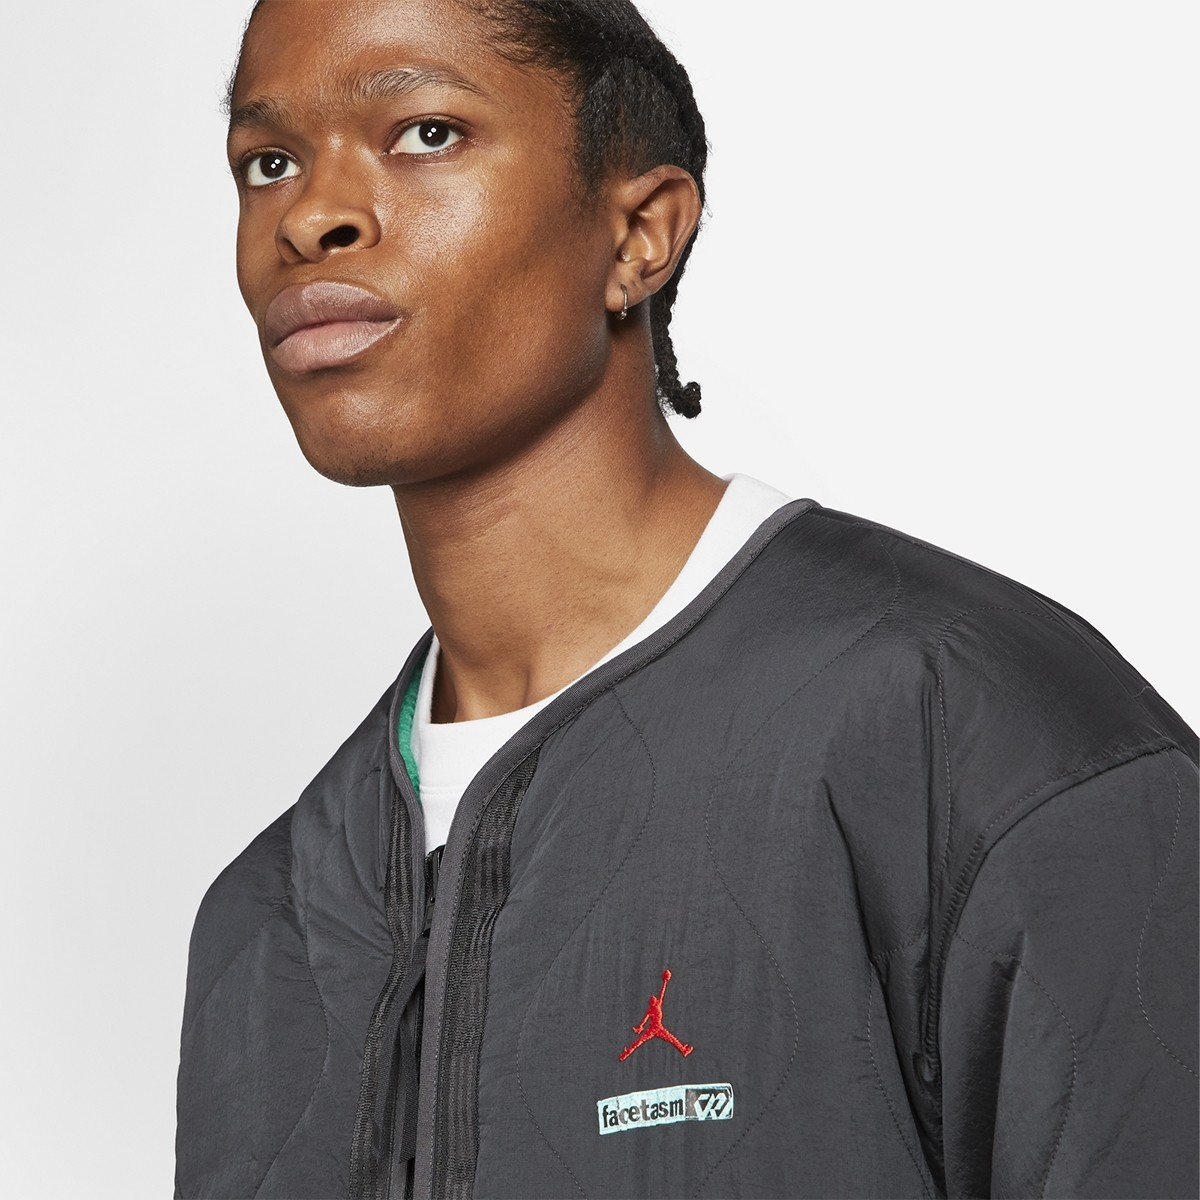 Jordan x Facetasm Why Not Reverse 'Black Multicolor'-DC4636-022